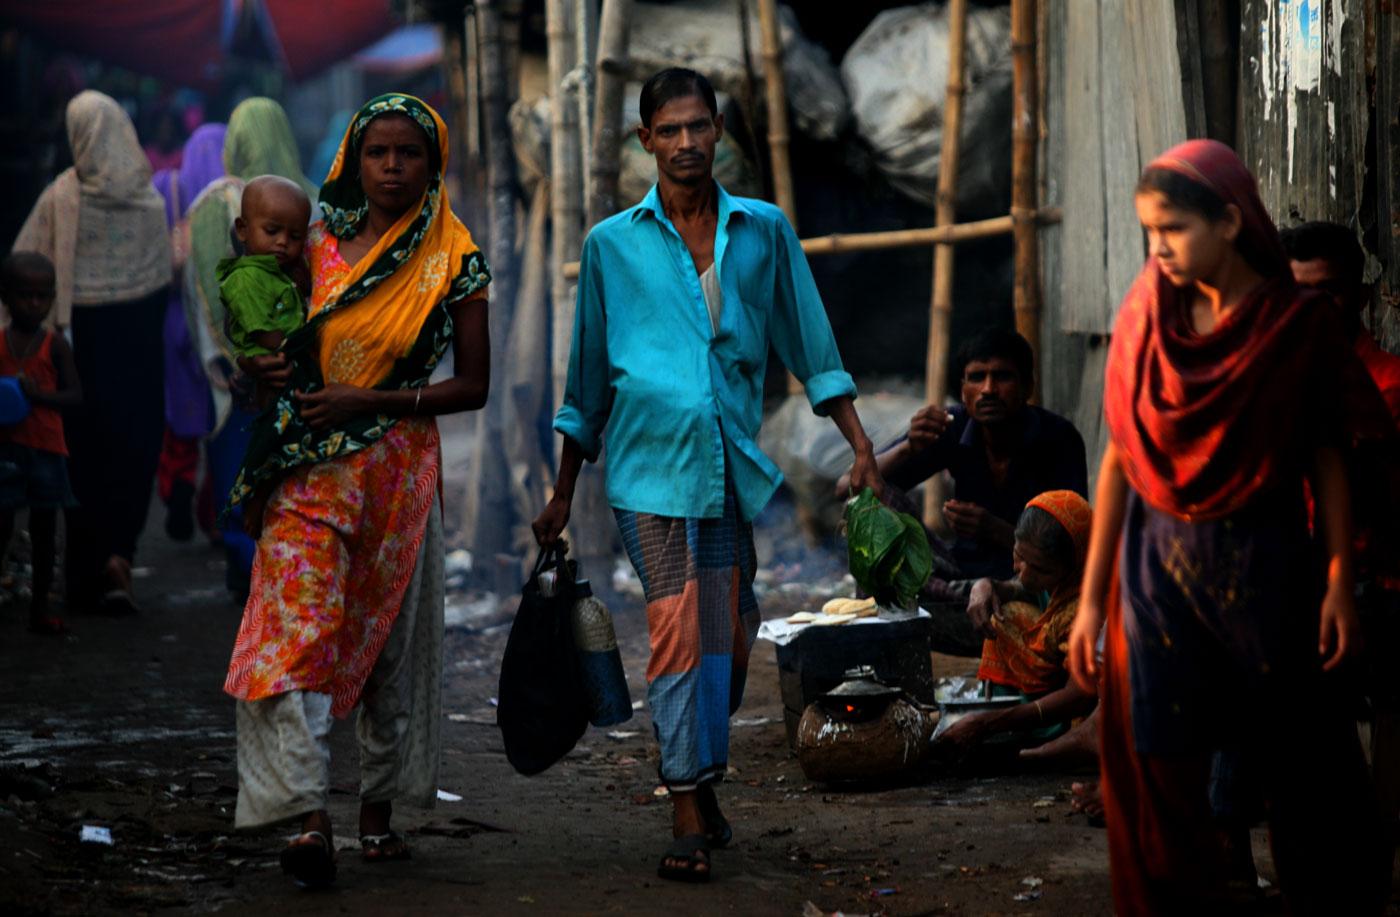 Nizam Hawladar walks through the slum area outside of his home.